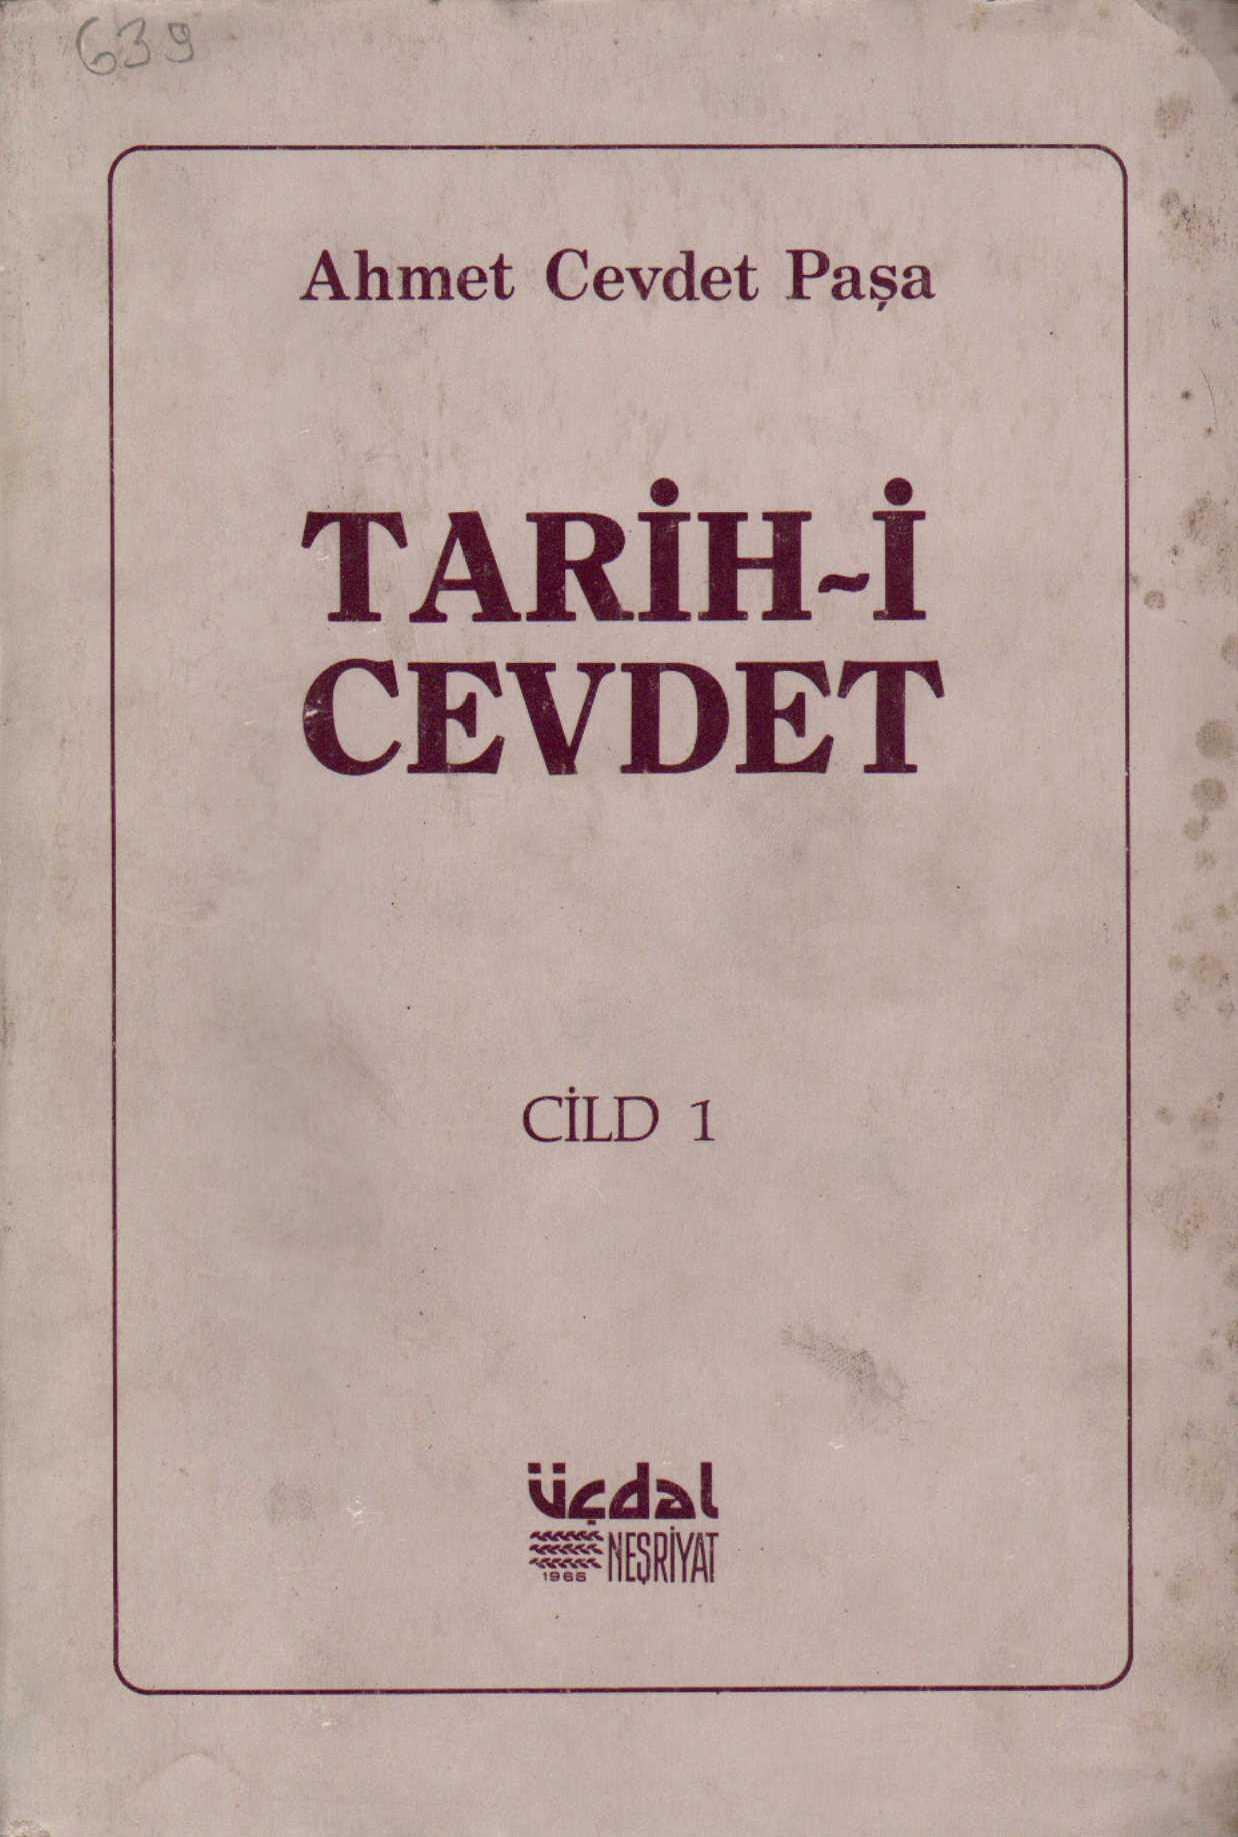 TARIH I CEVDET EPUB